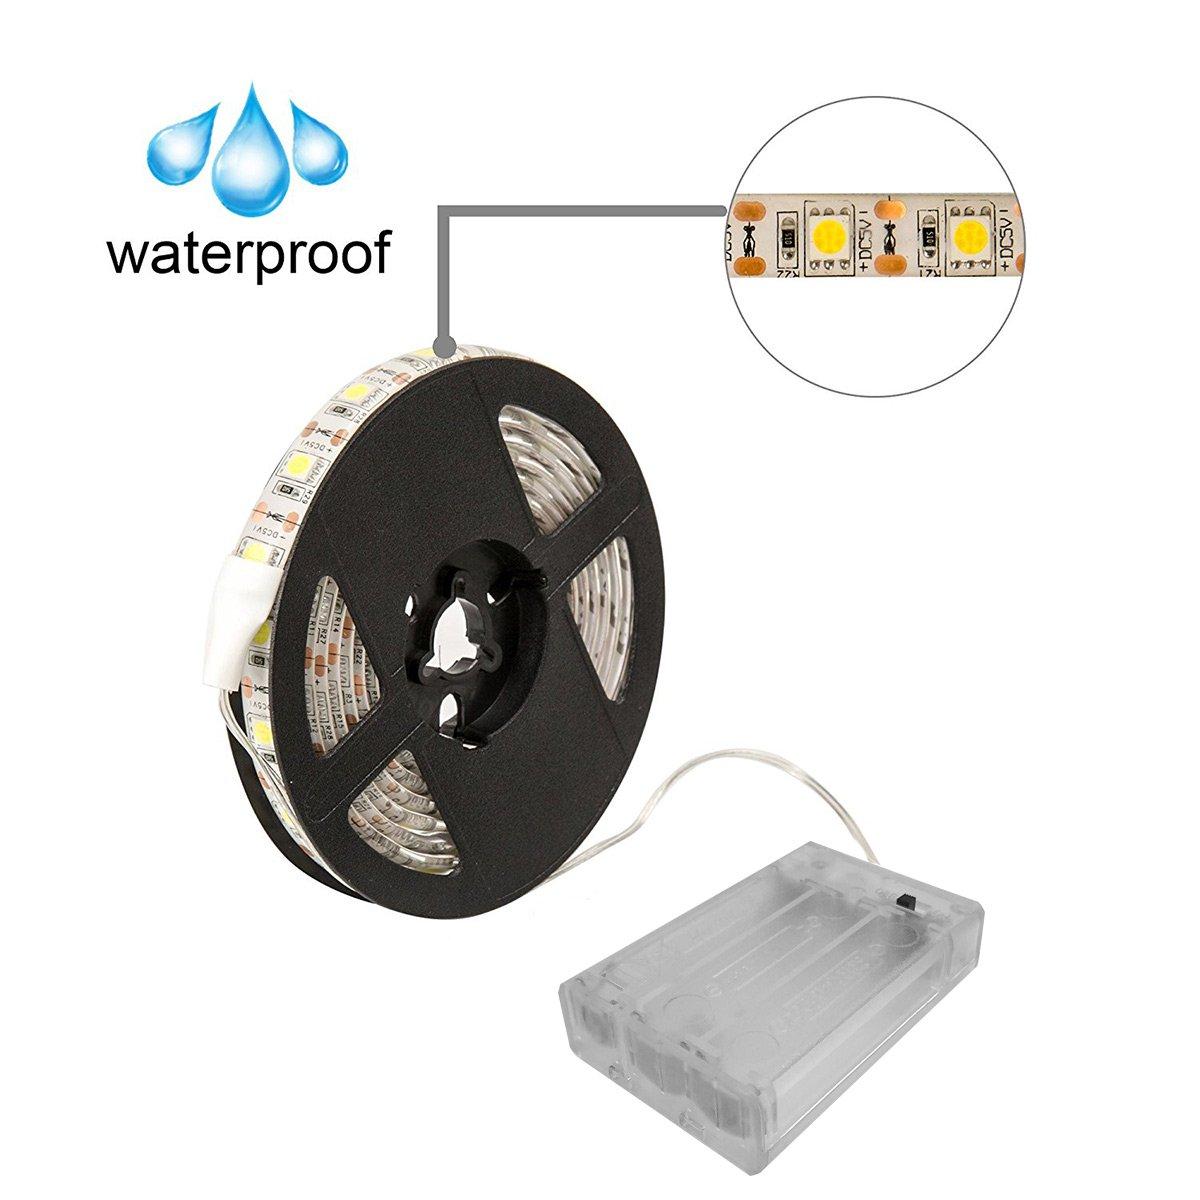 2M//6.56ft, Cool White Battery Powered Led Strip Lights,Geekeep Waterproof Flexible LED Light Strips SMD 5050 LED Ribbon Light Mood Light